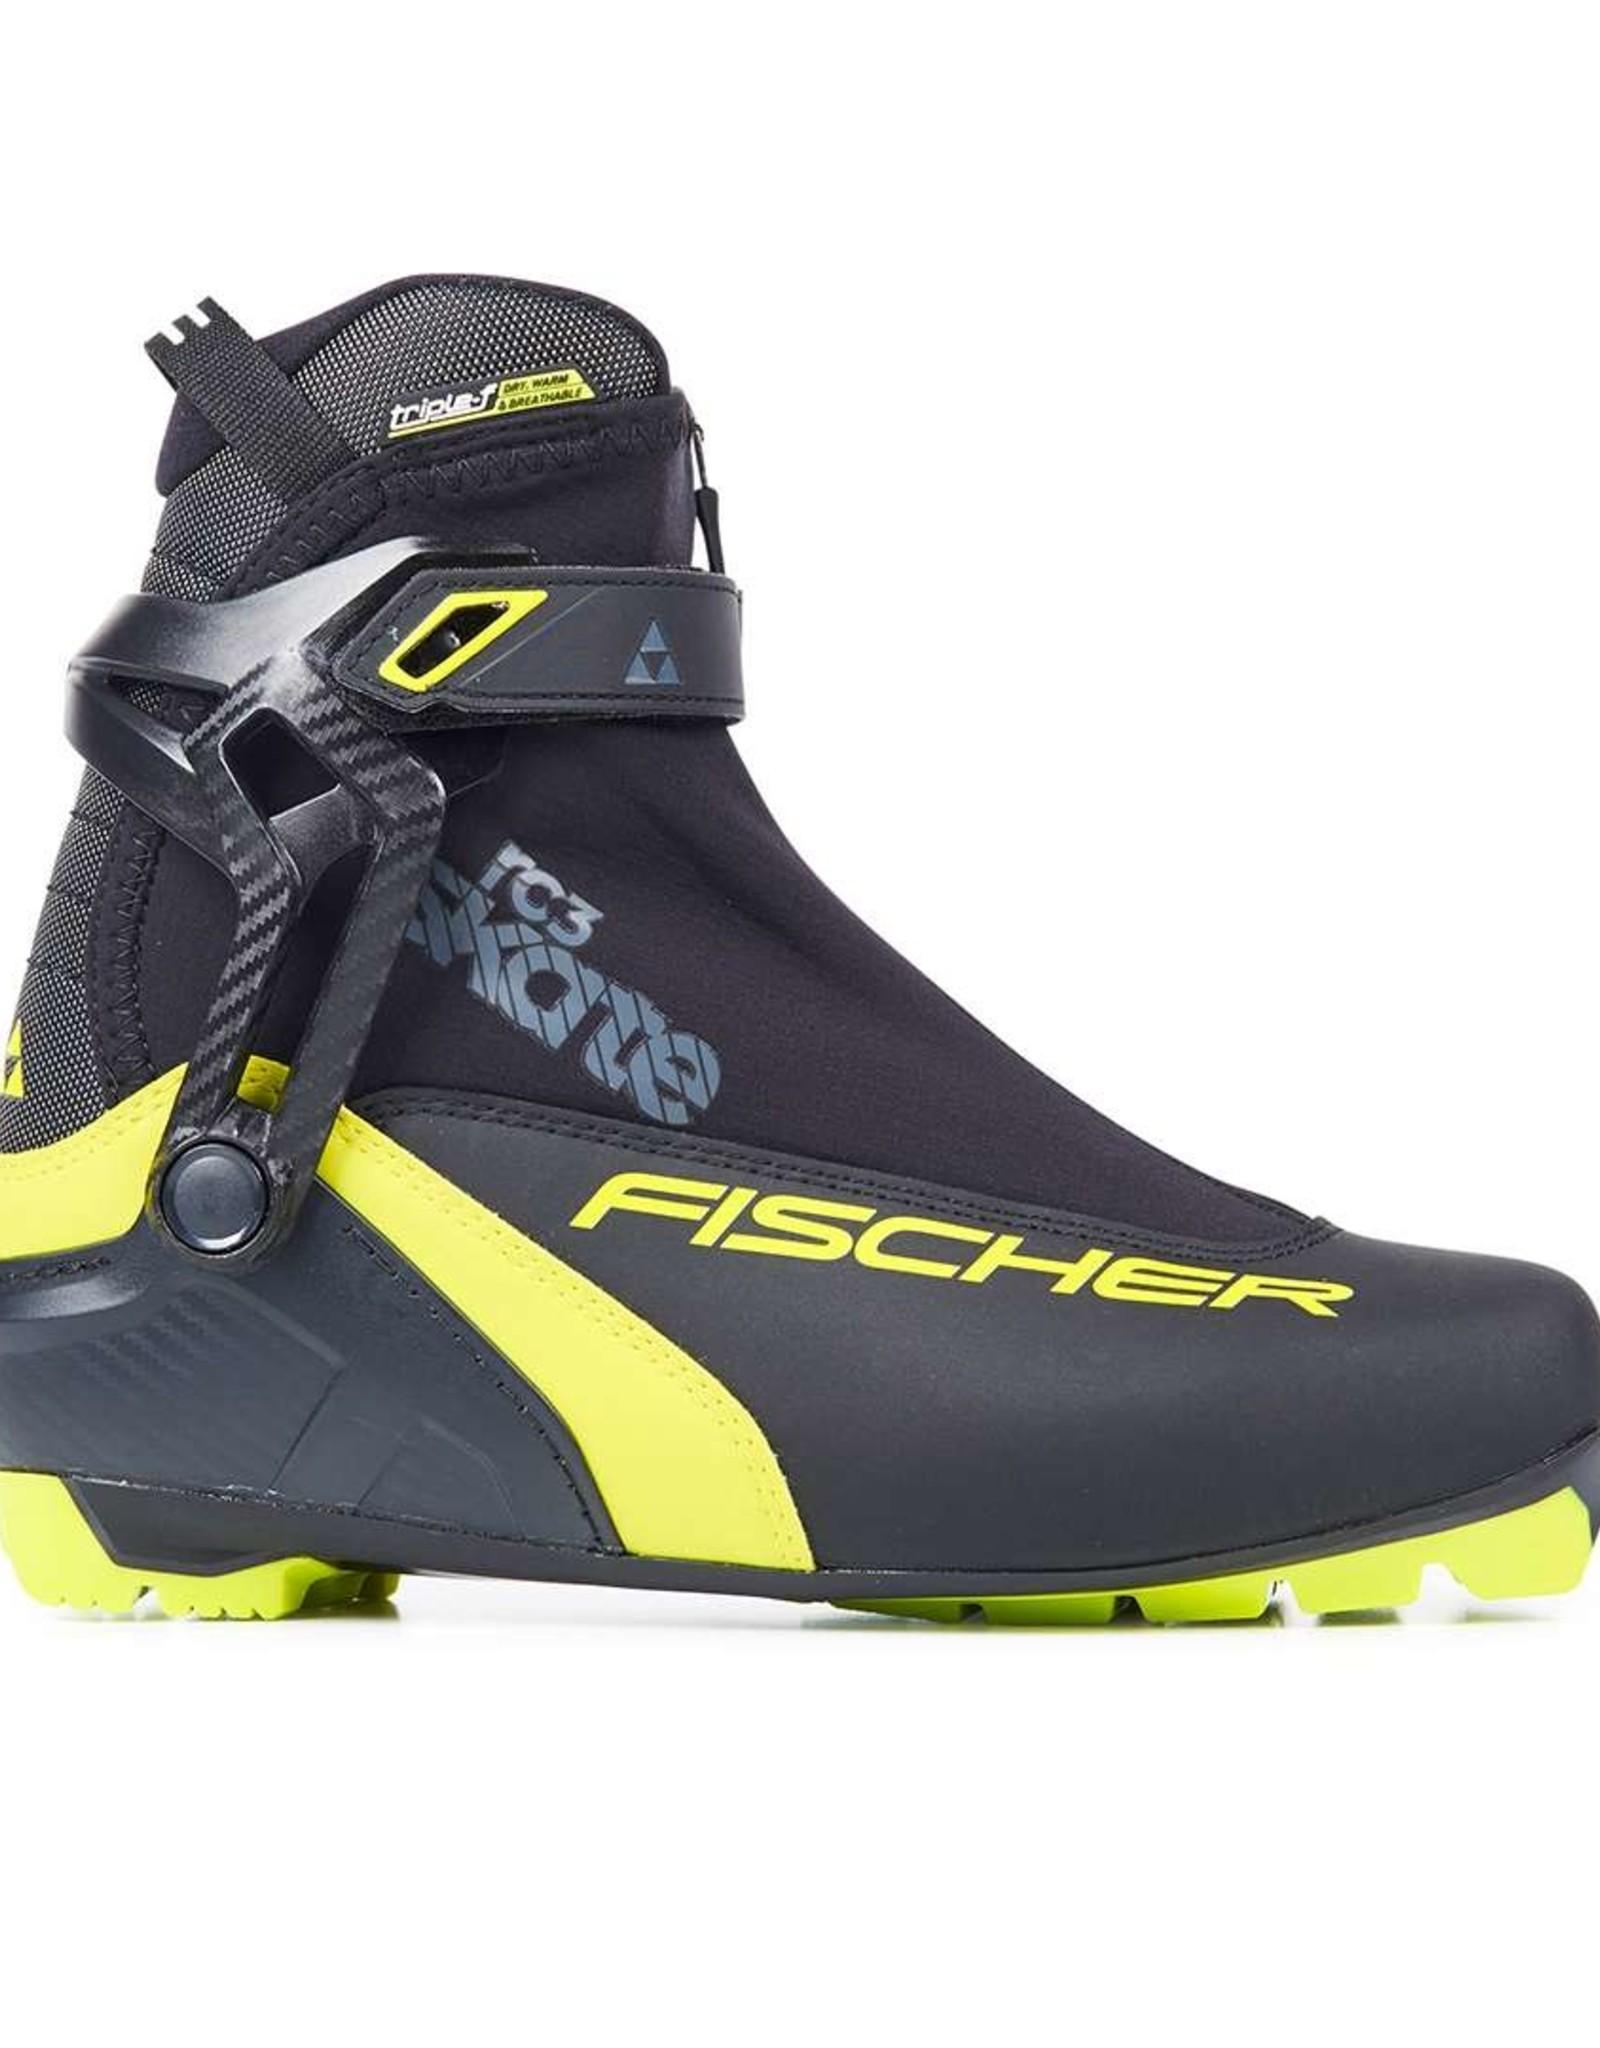 Fischer Skate Boots